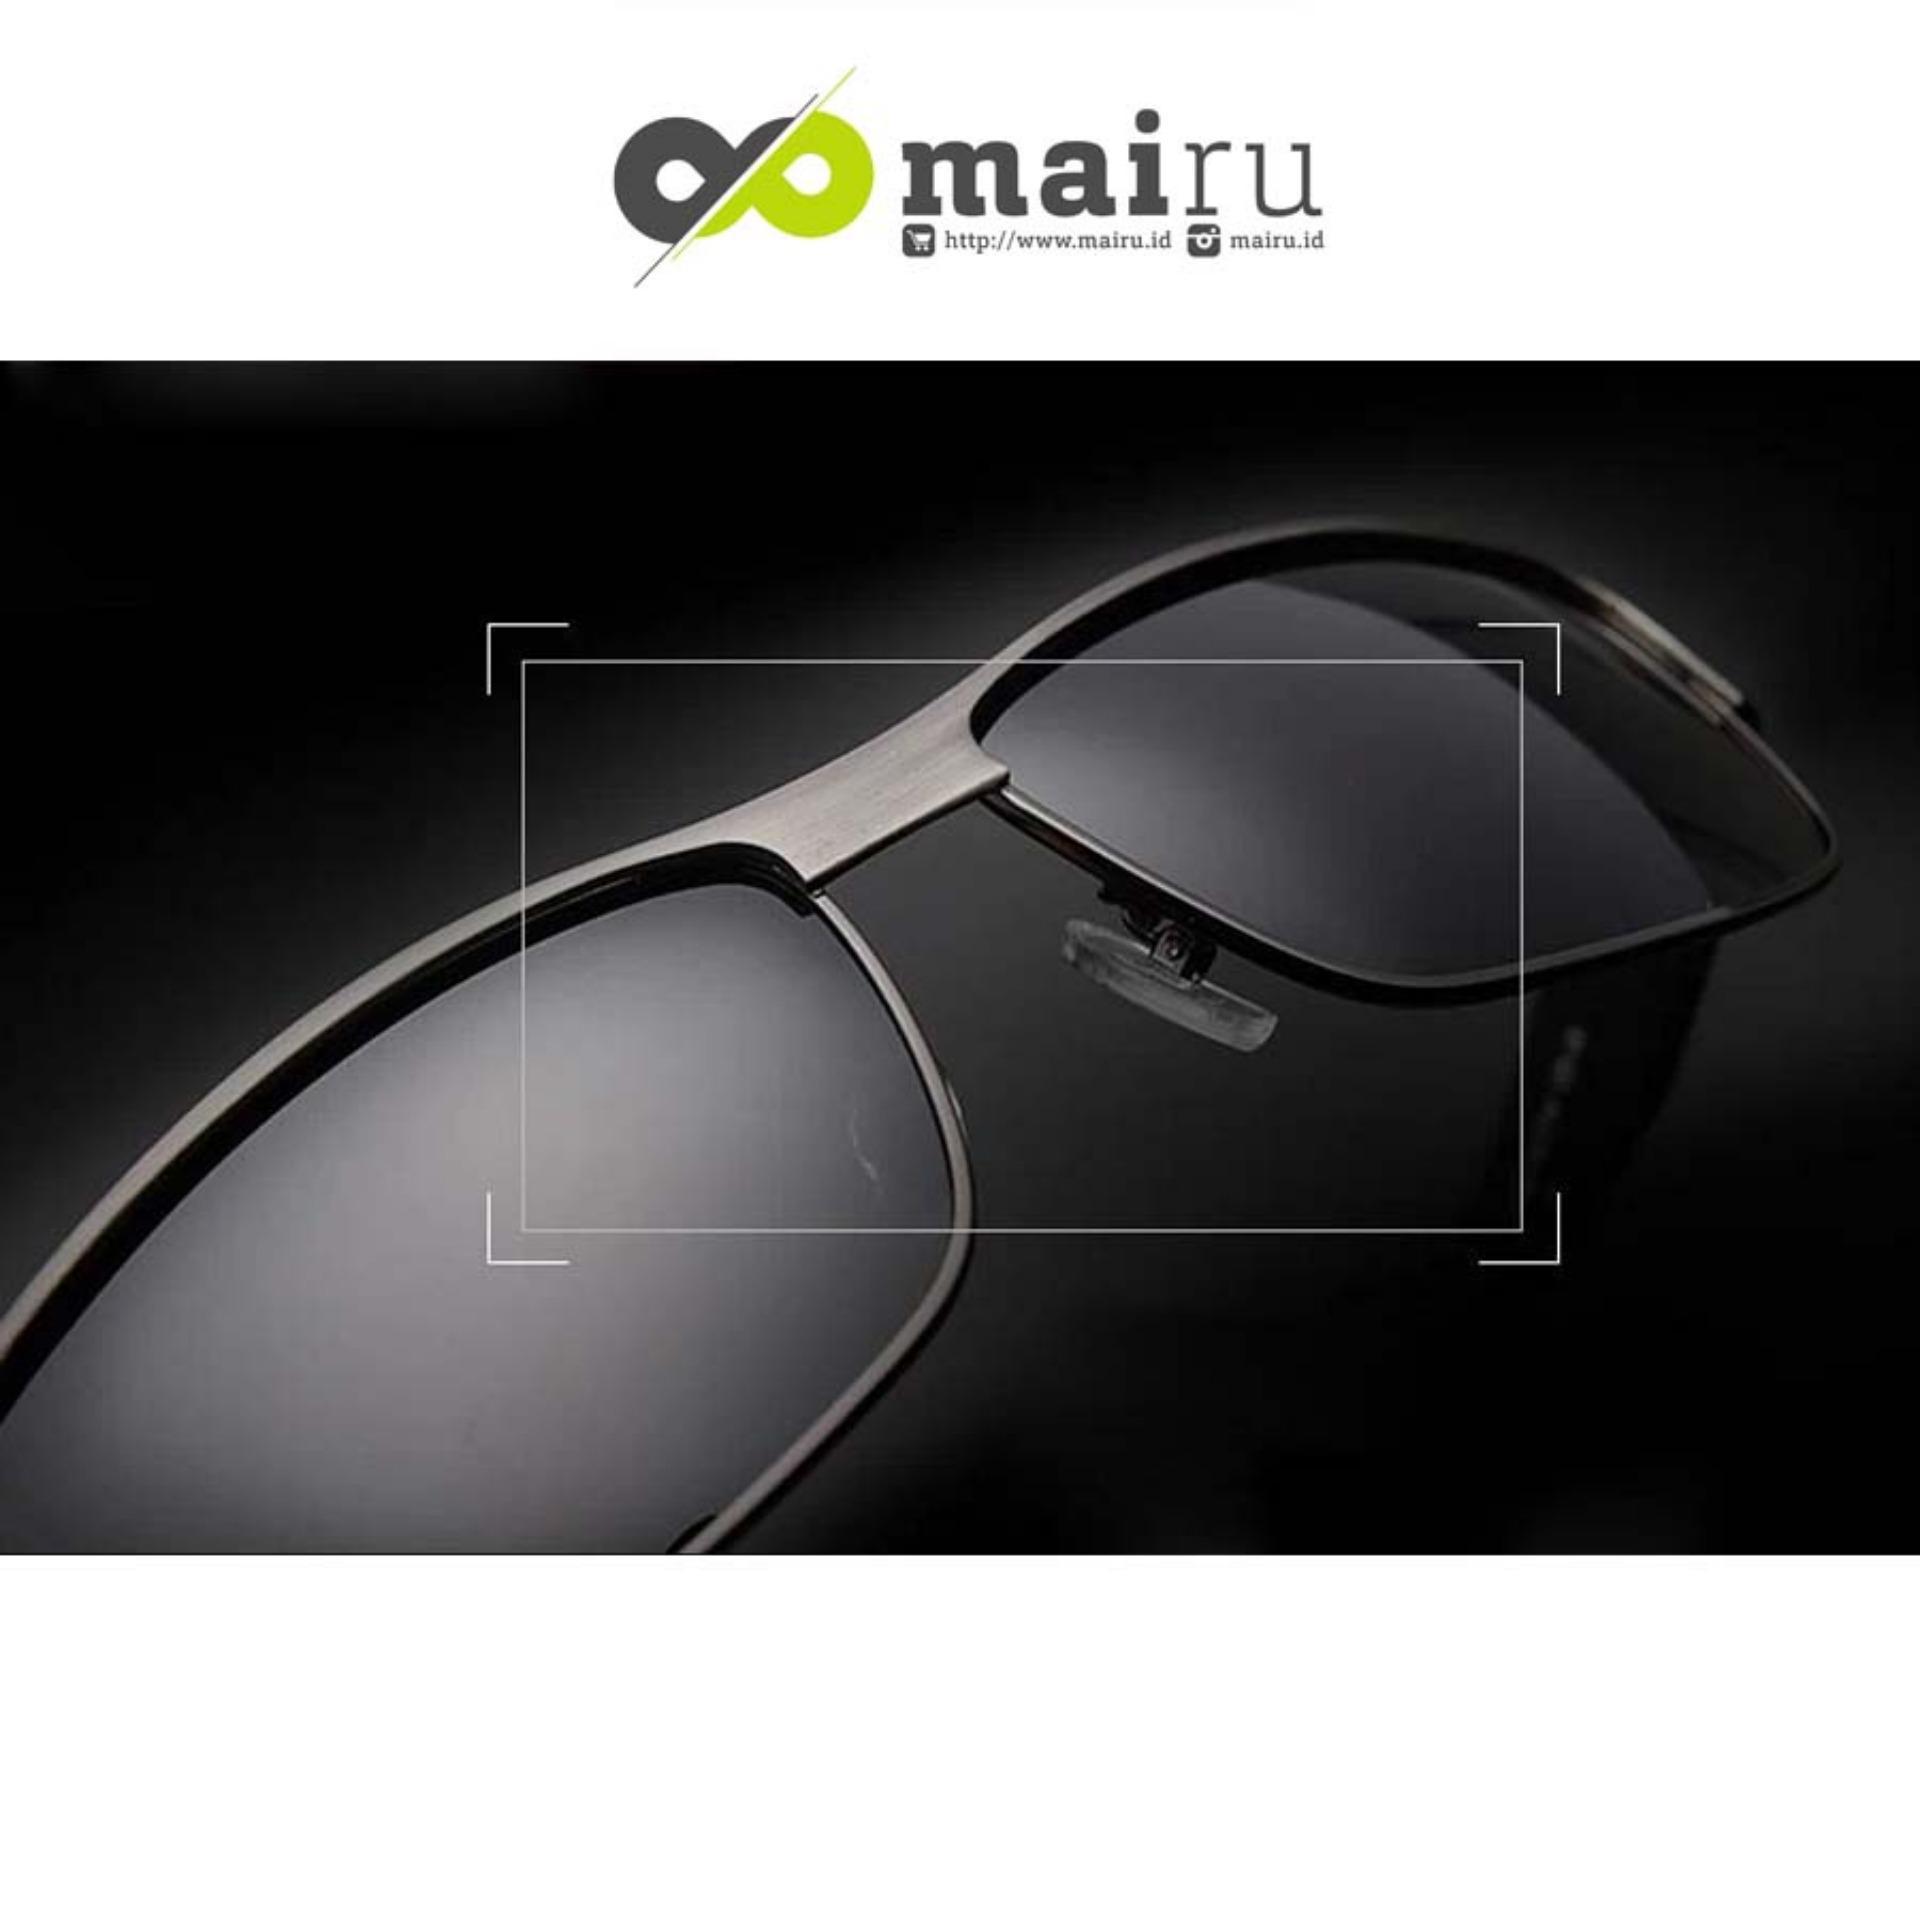 Daftar Harga Mairu 8485 Kacamata Anti Radiasi Komputer Frame Computer Ampamp Tv Ringan Dan Elegant Bebas Gadget